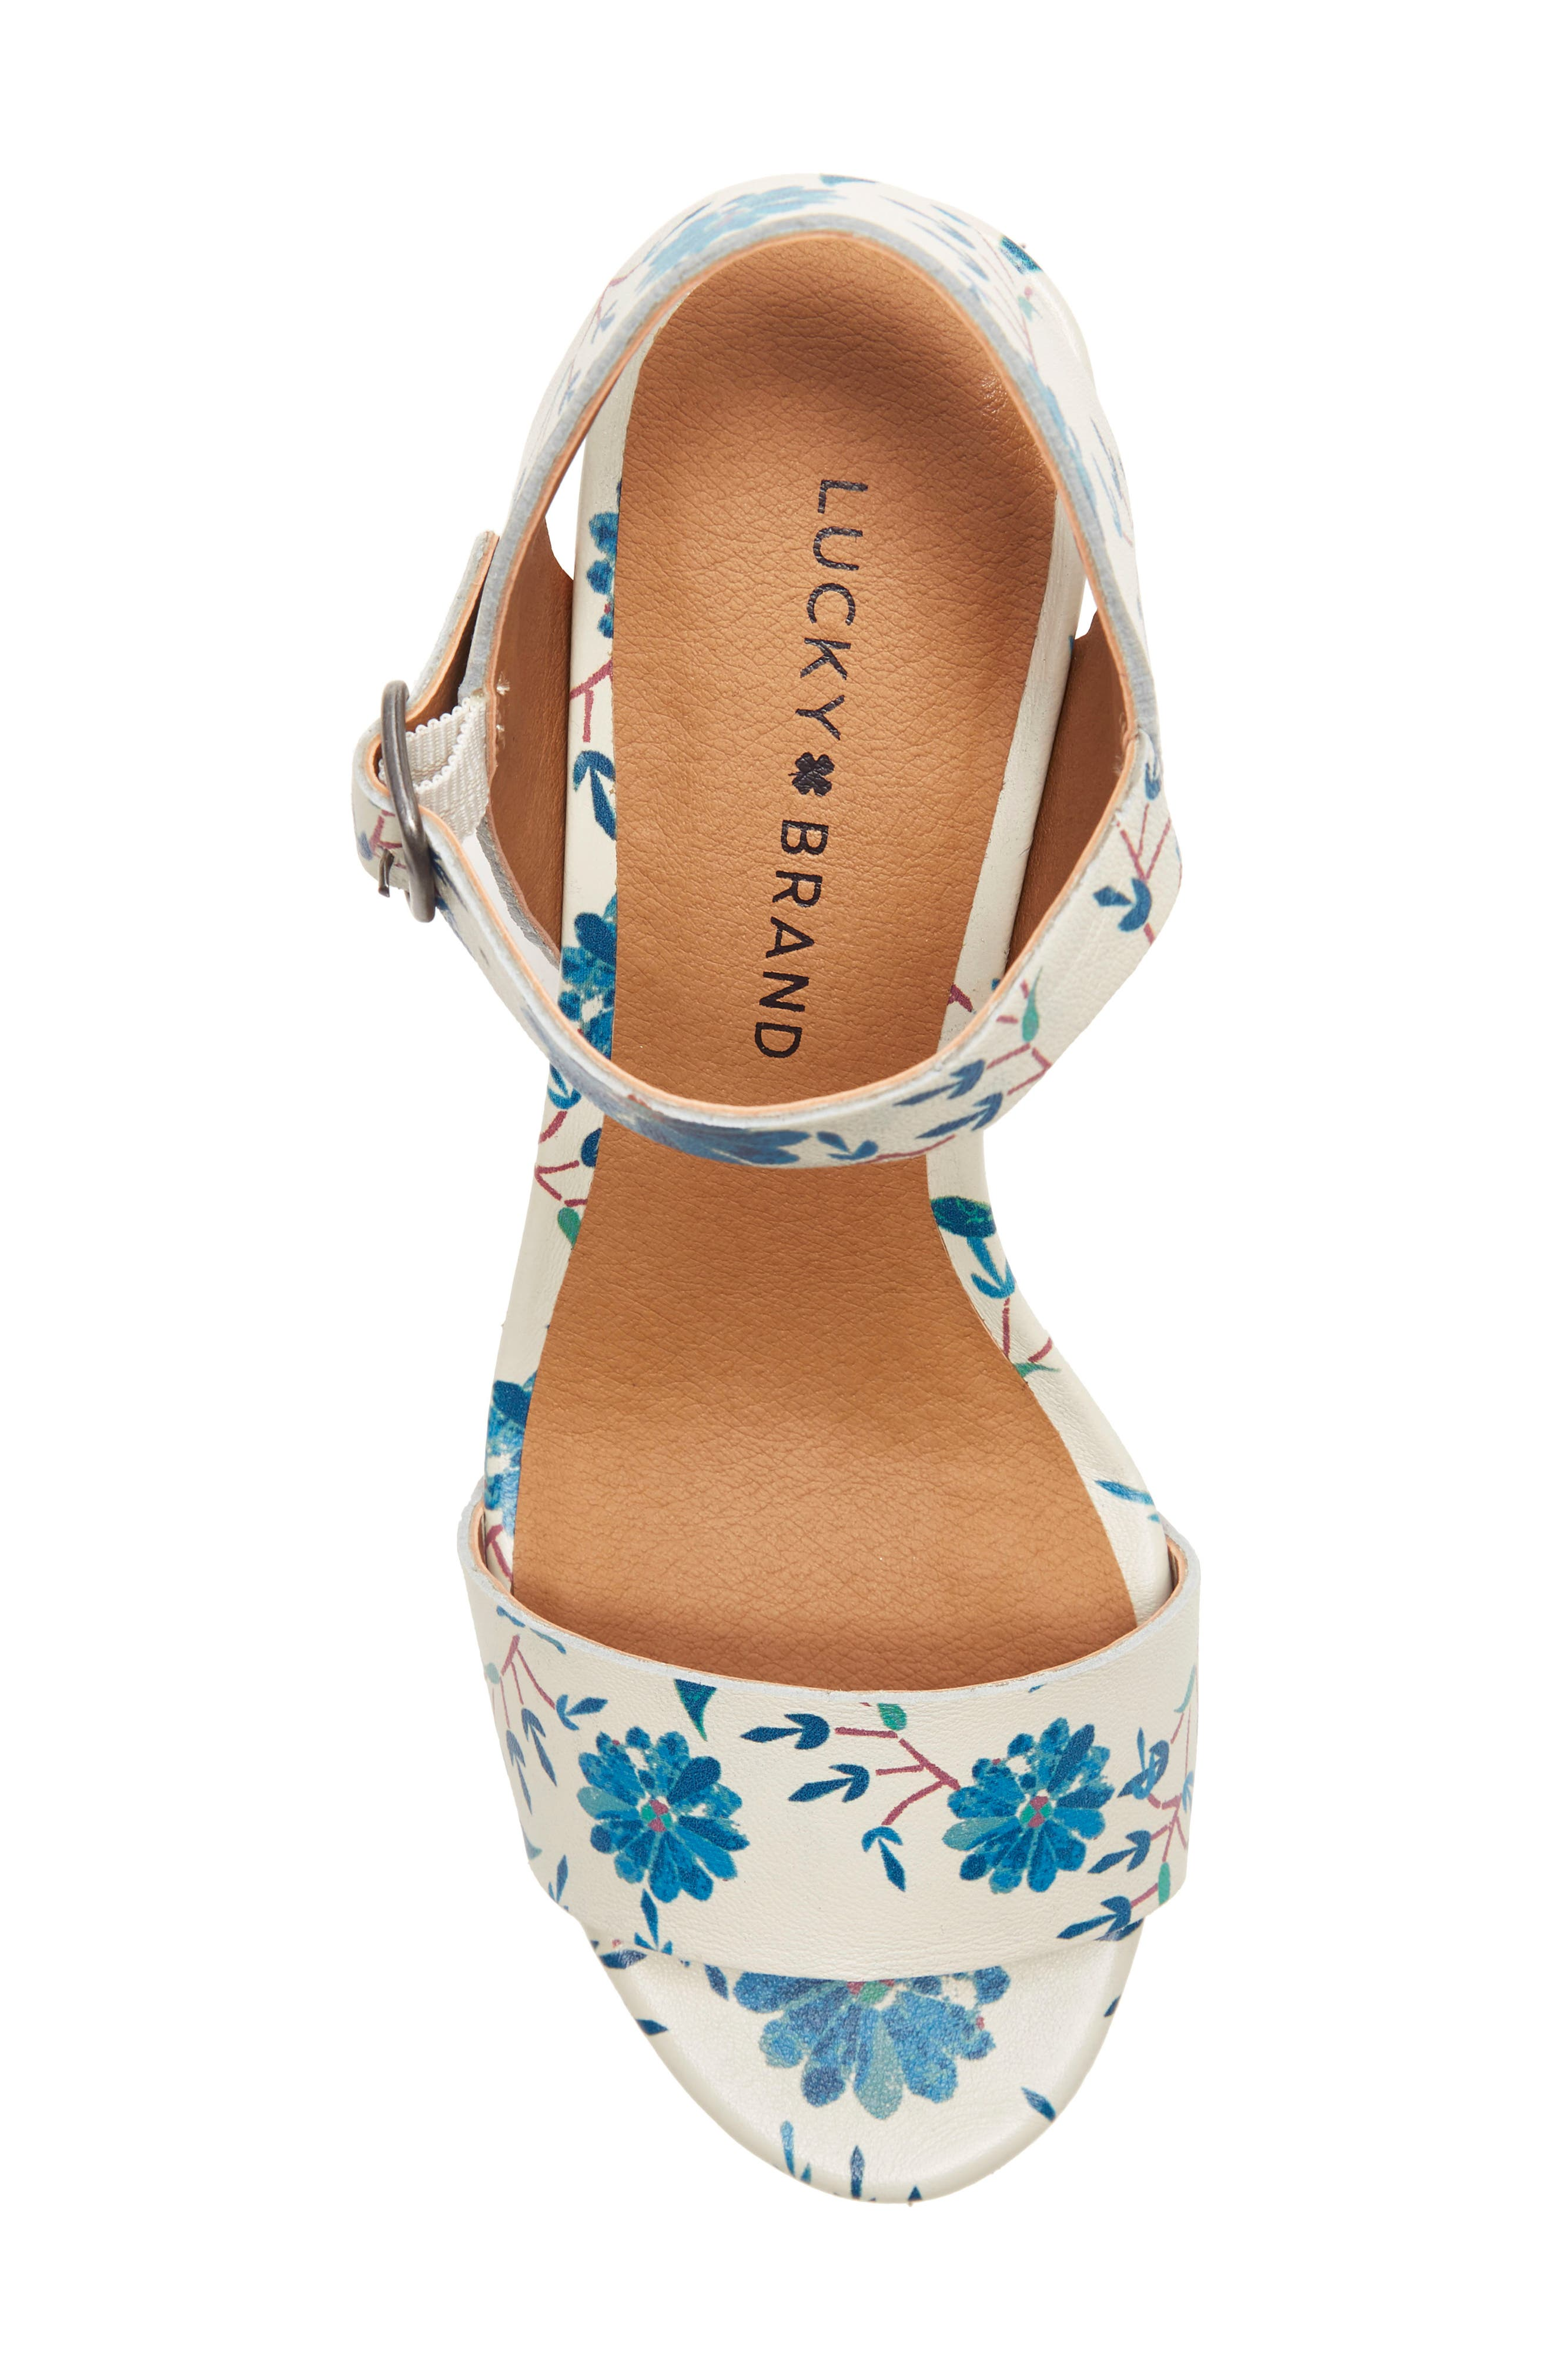 LUCKY BRAND, Trisa Platform Sandal, Alternate thumbnail 5, color, BIRCH LEATHER